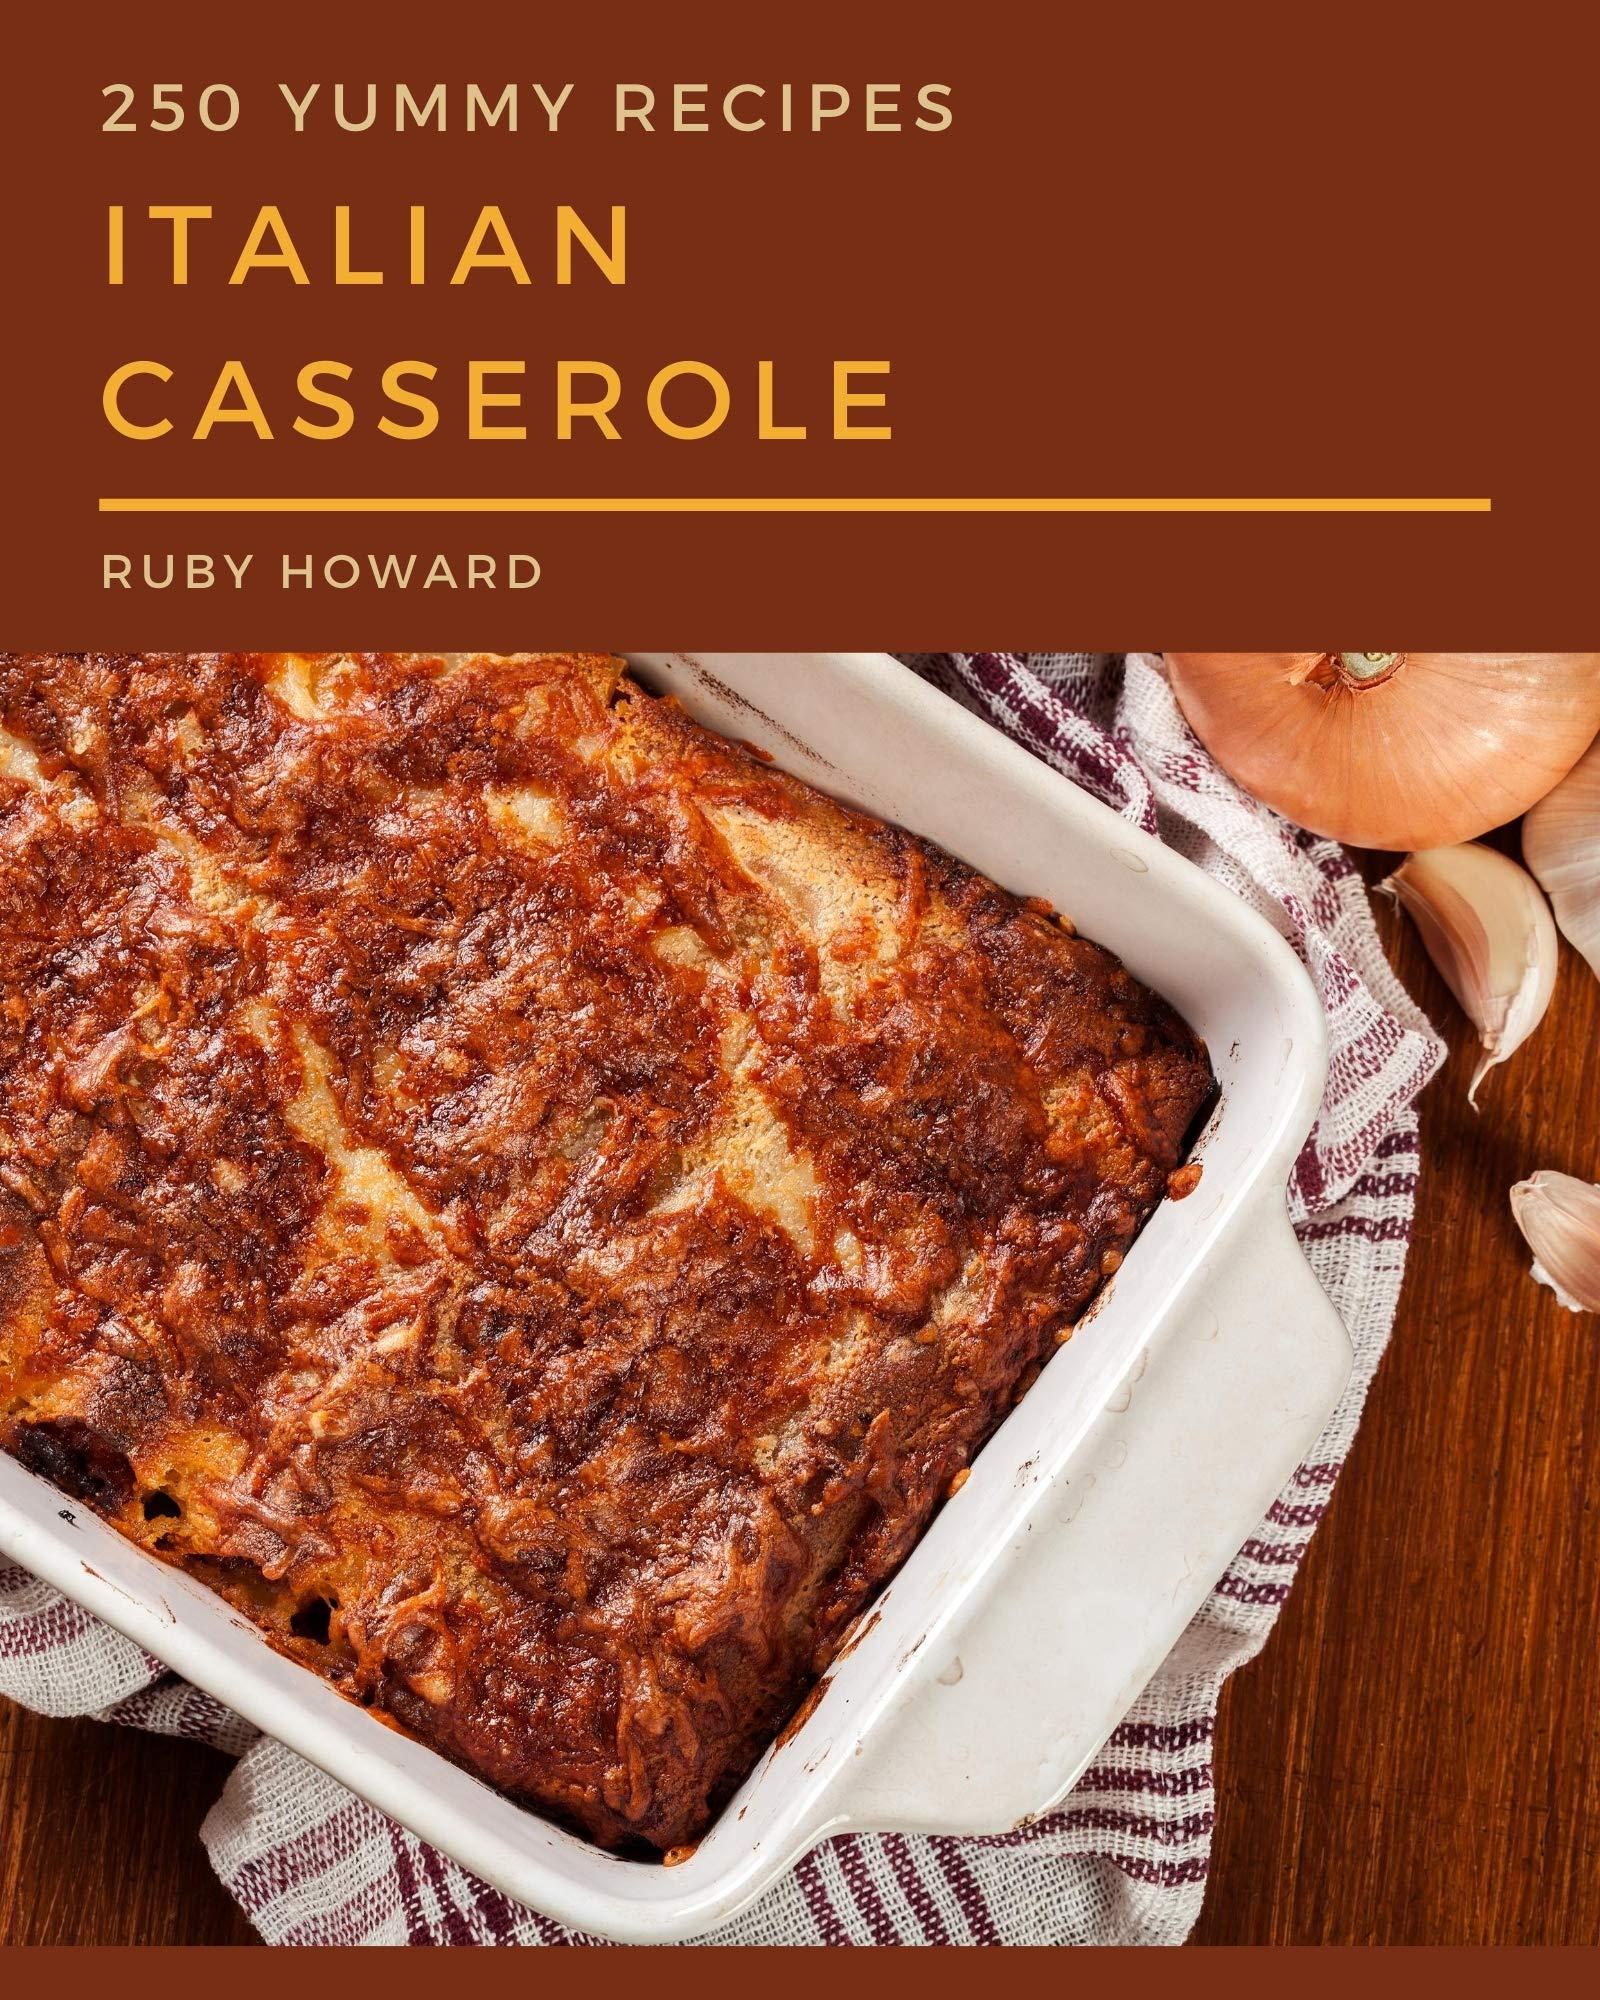 250 Yummy Italian Casserole Recipes: The Highest Rated Yummy Italian Casserole Cookbook You Should Read